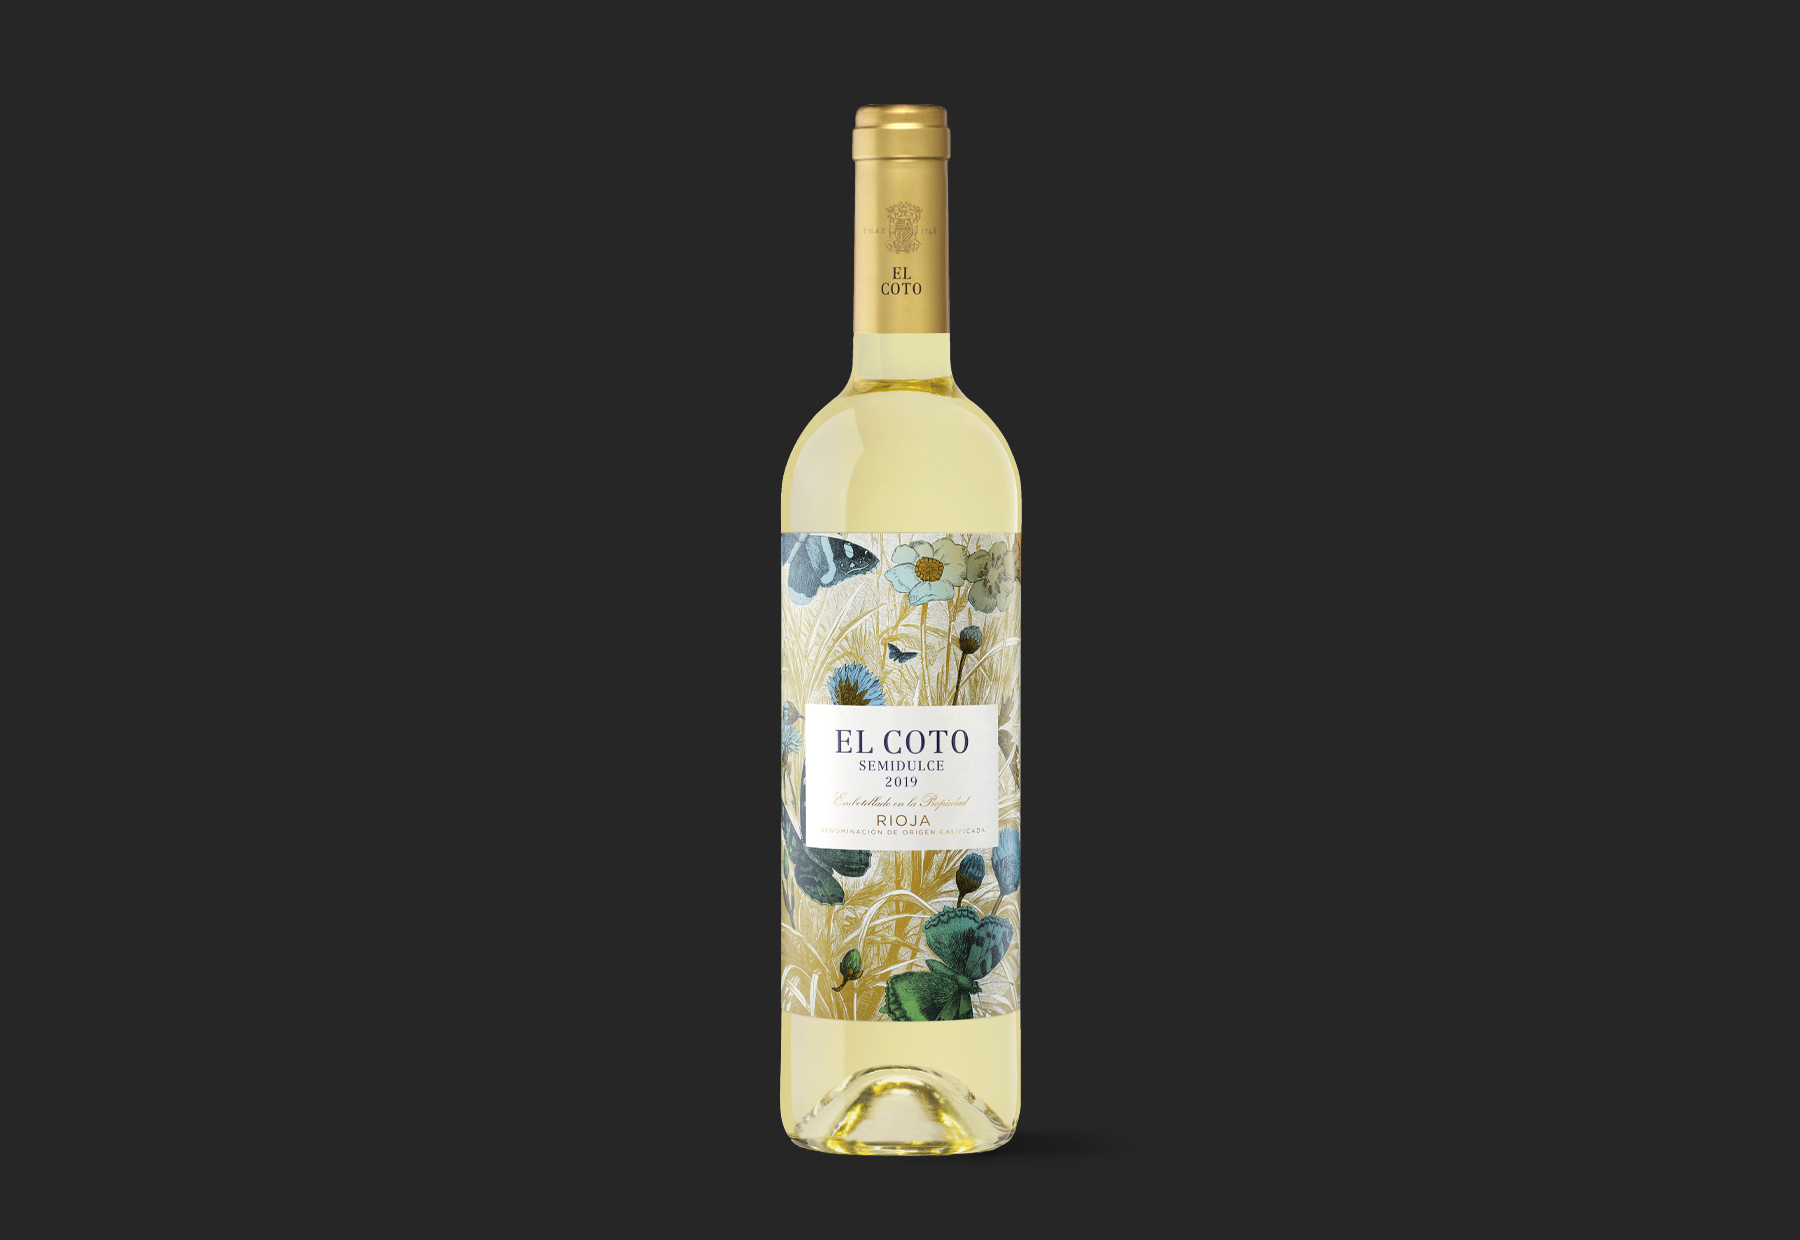 El Coto Semidulce Wine Packaging Design by Moruba